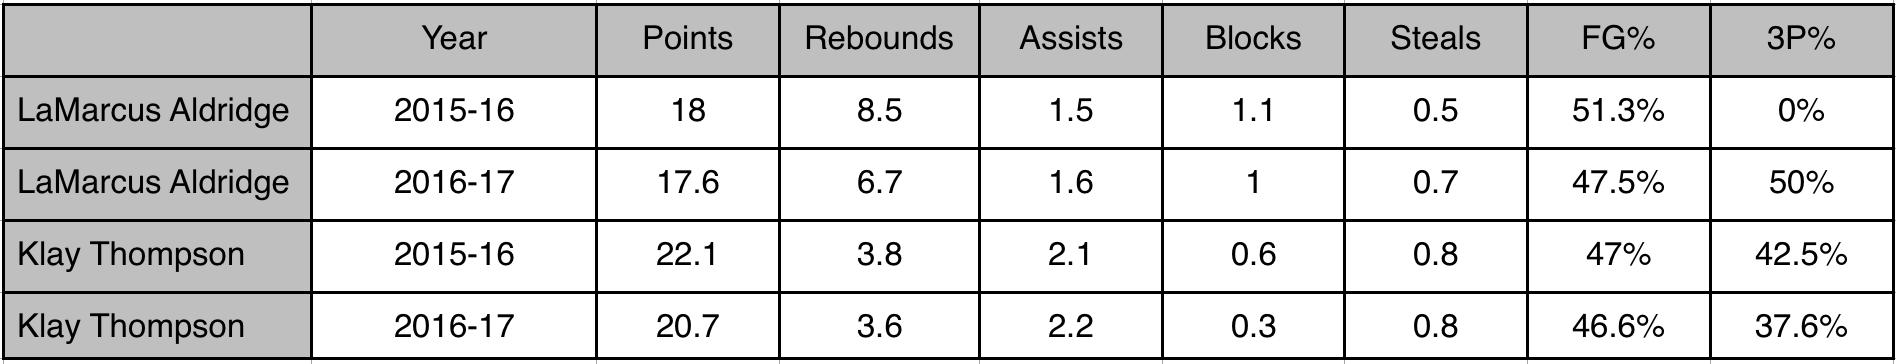 Klay Thompson and LaMarcus Aldridge Stats